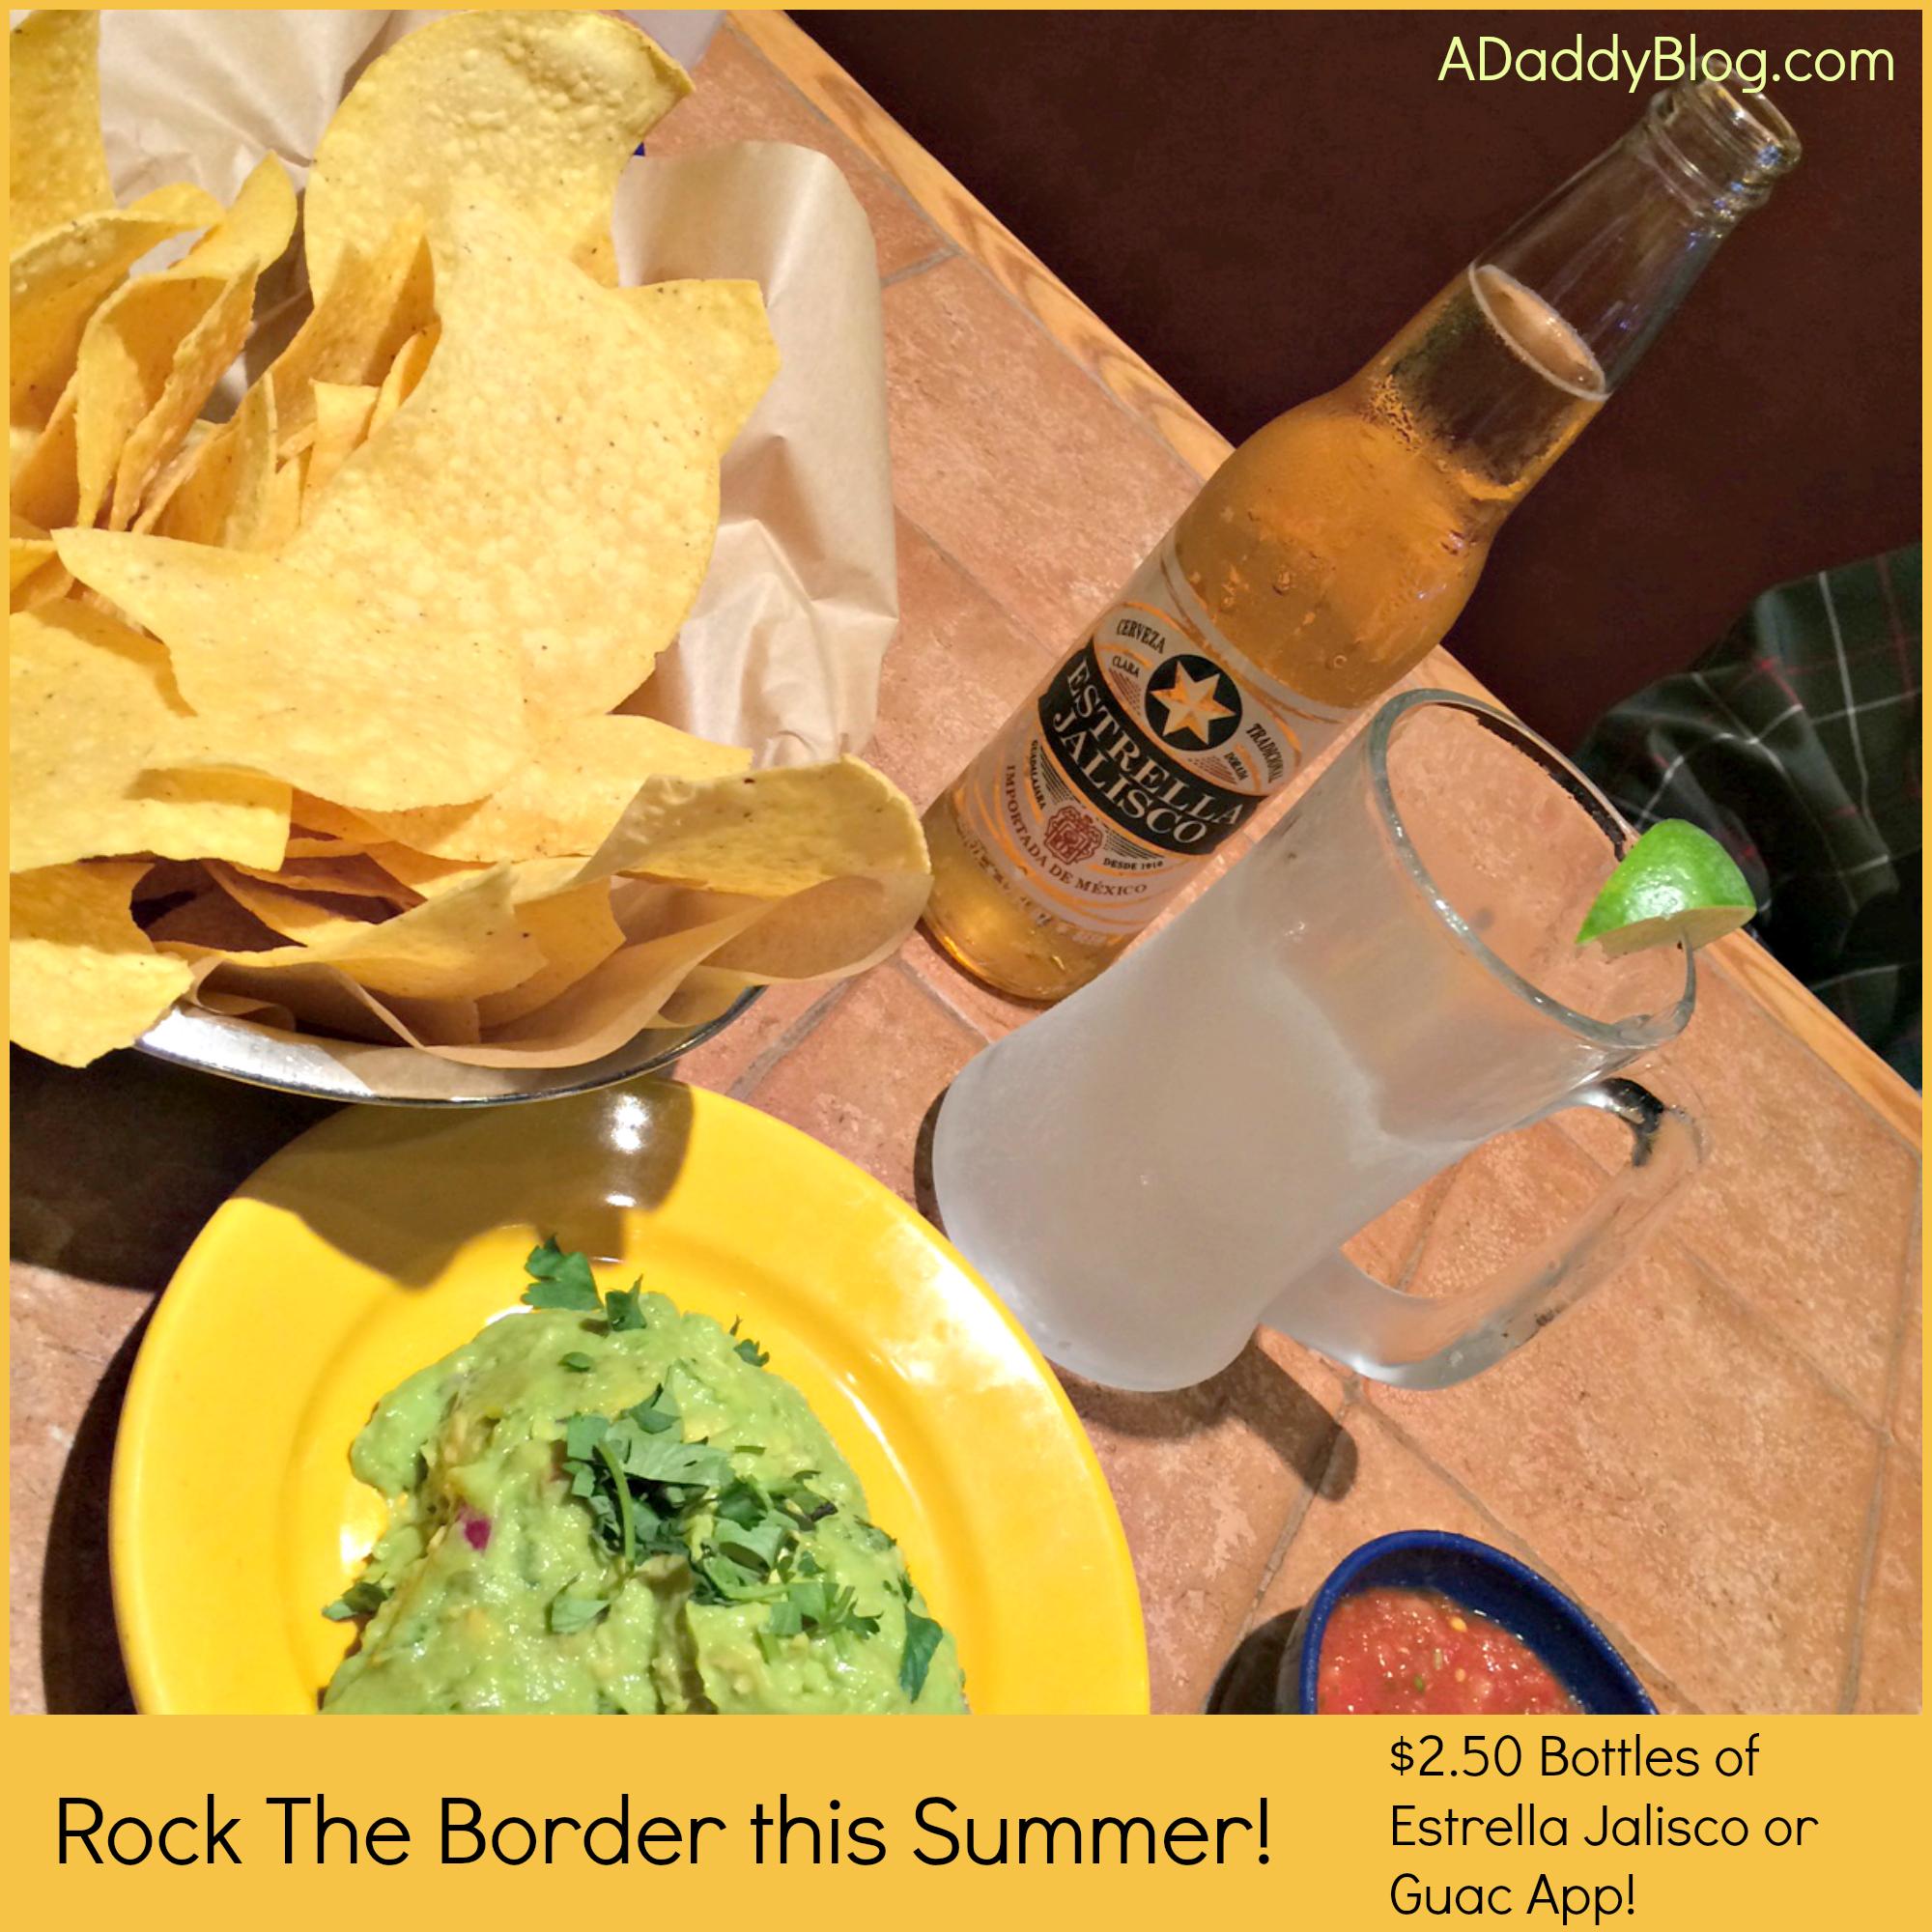 rock the border deal